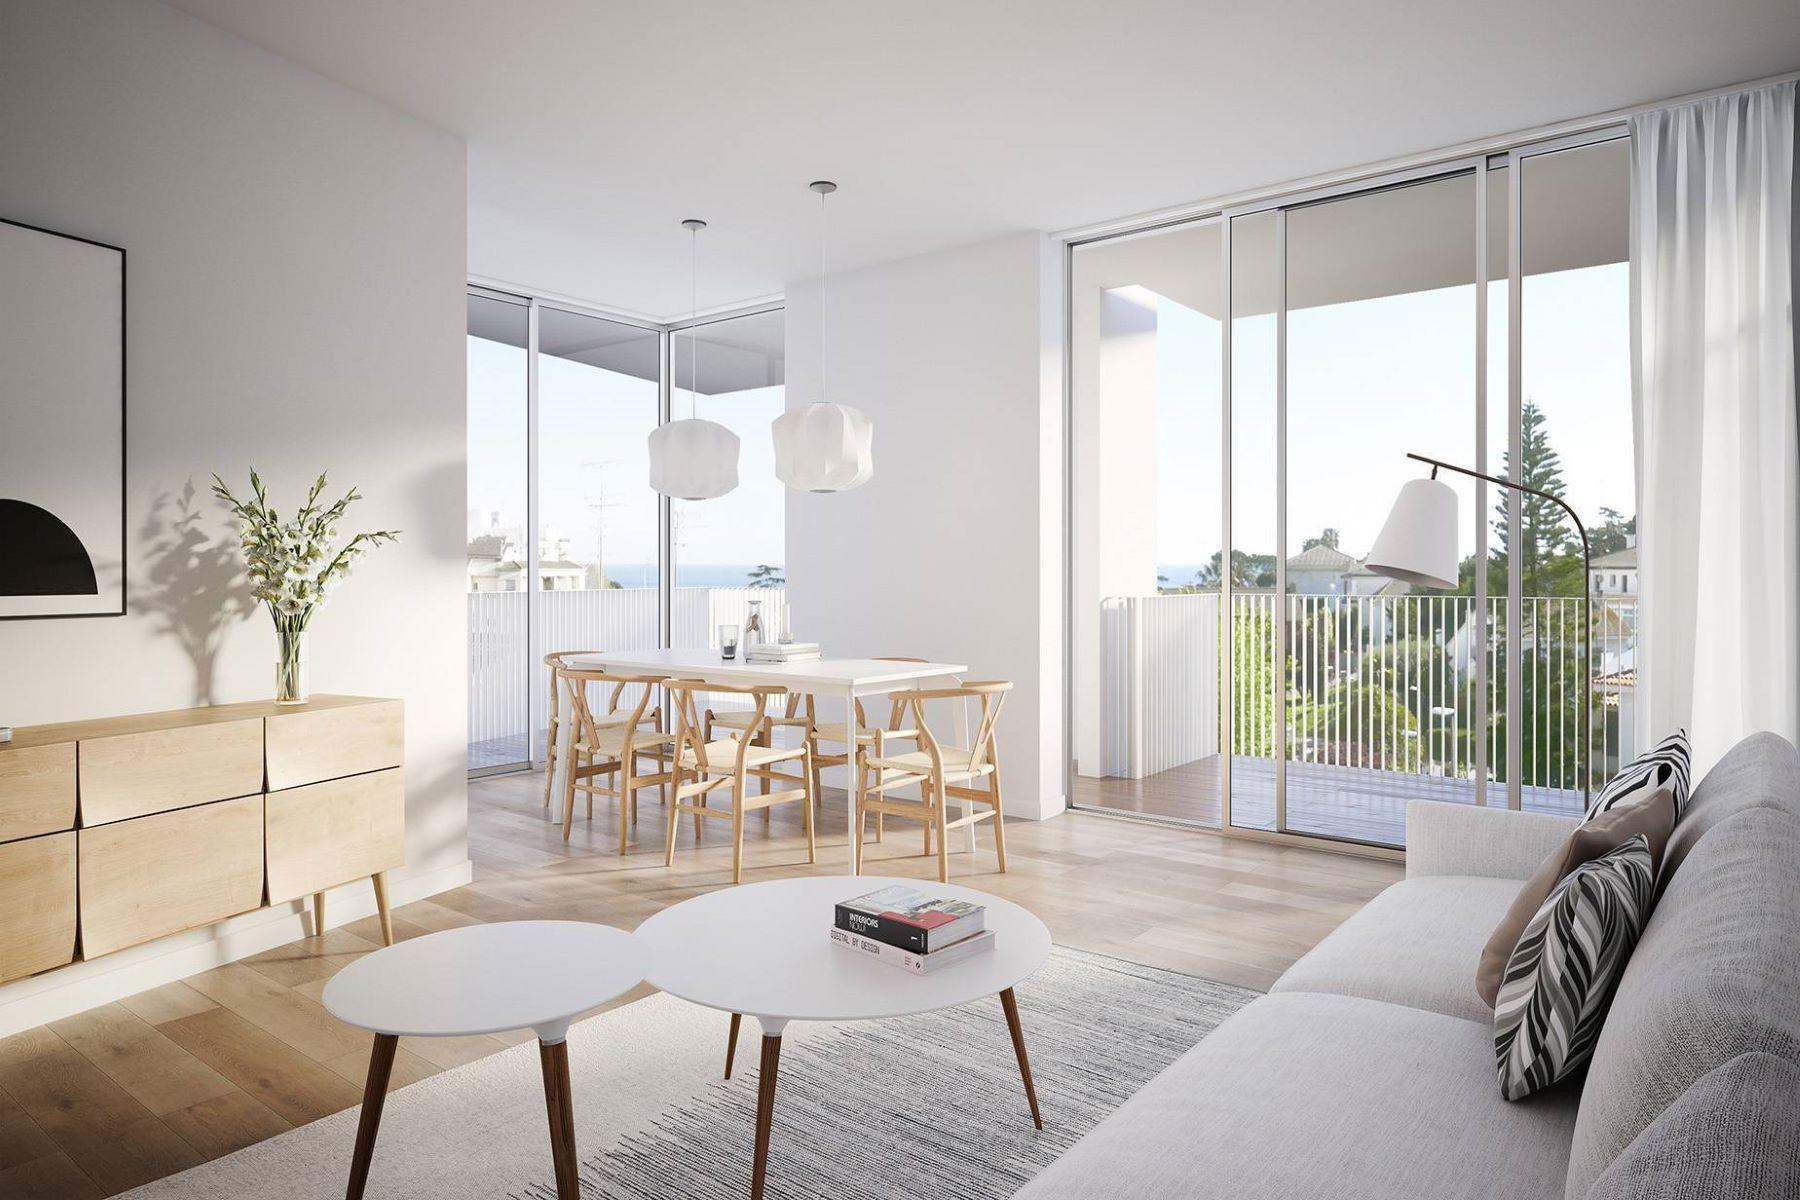 公寓 为 销售 在 Unique New Apartments in Alella 阿莱利亚, 巴塞罗那, 08328 西班牙